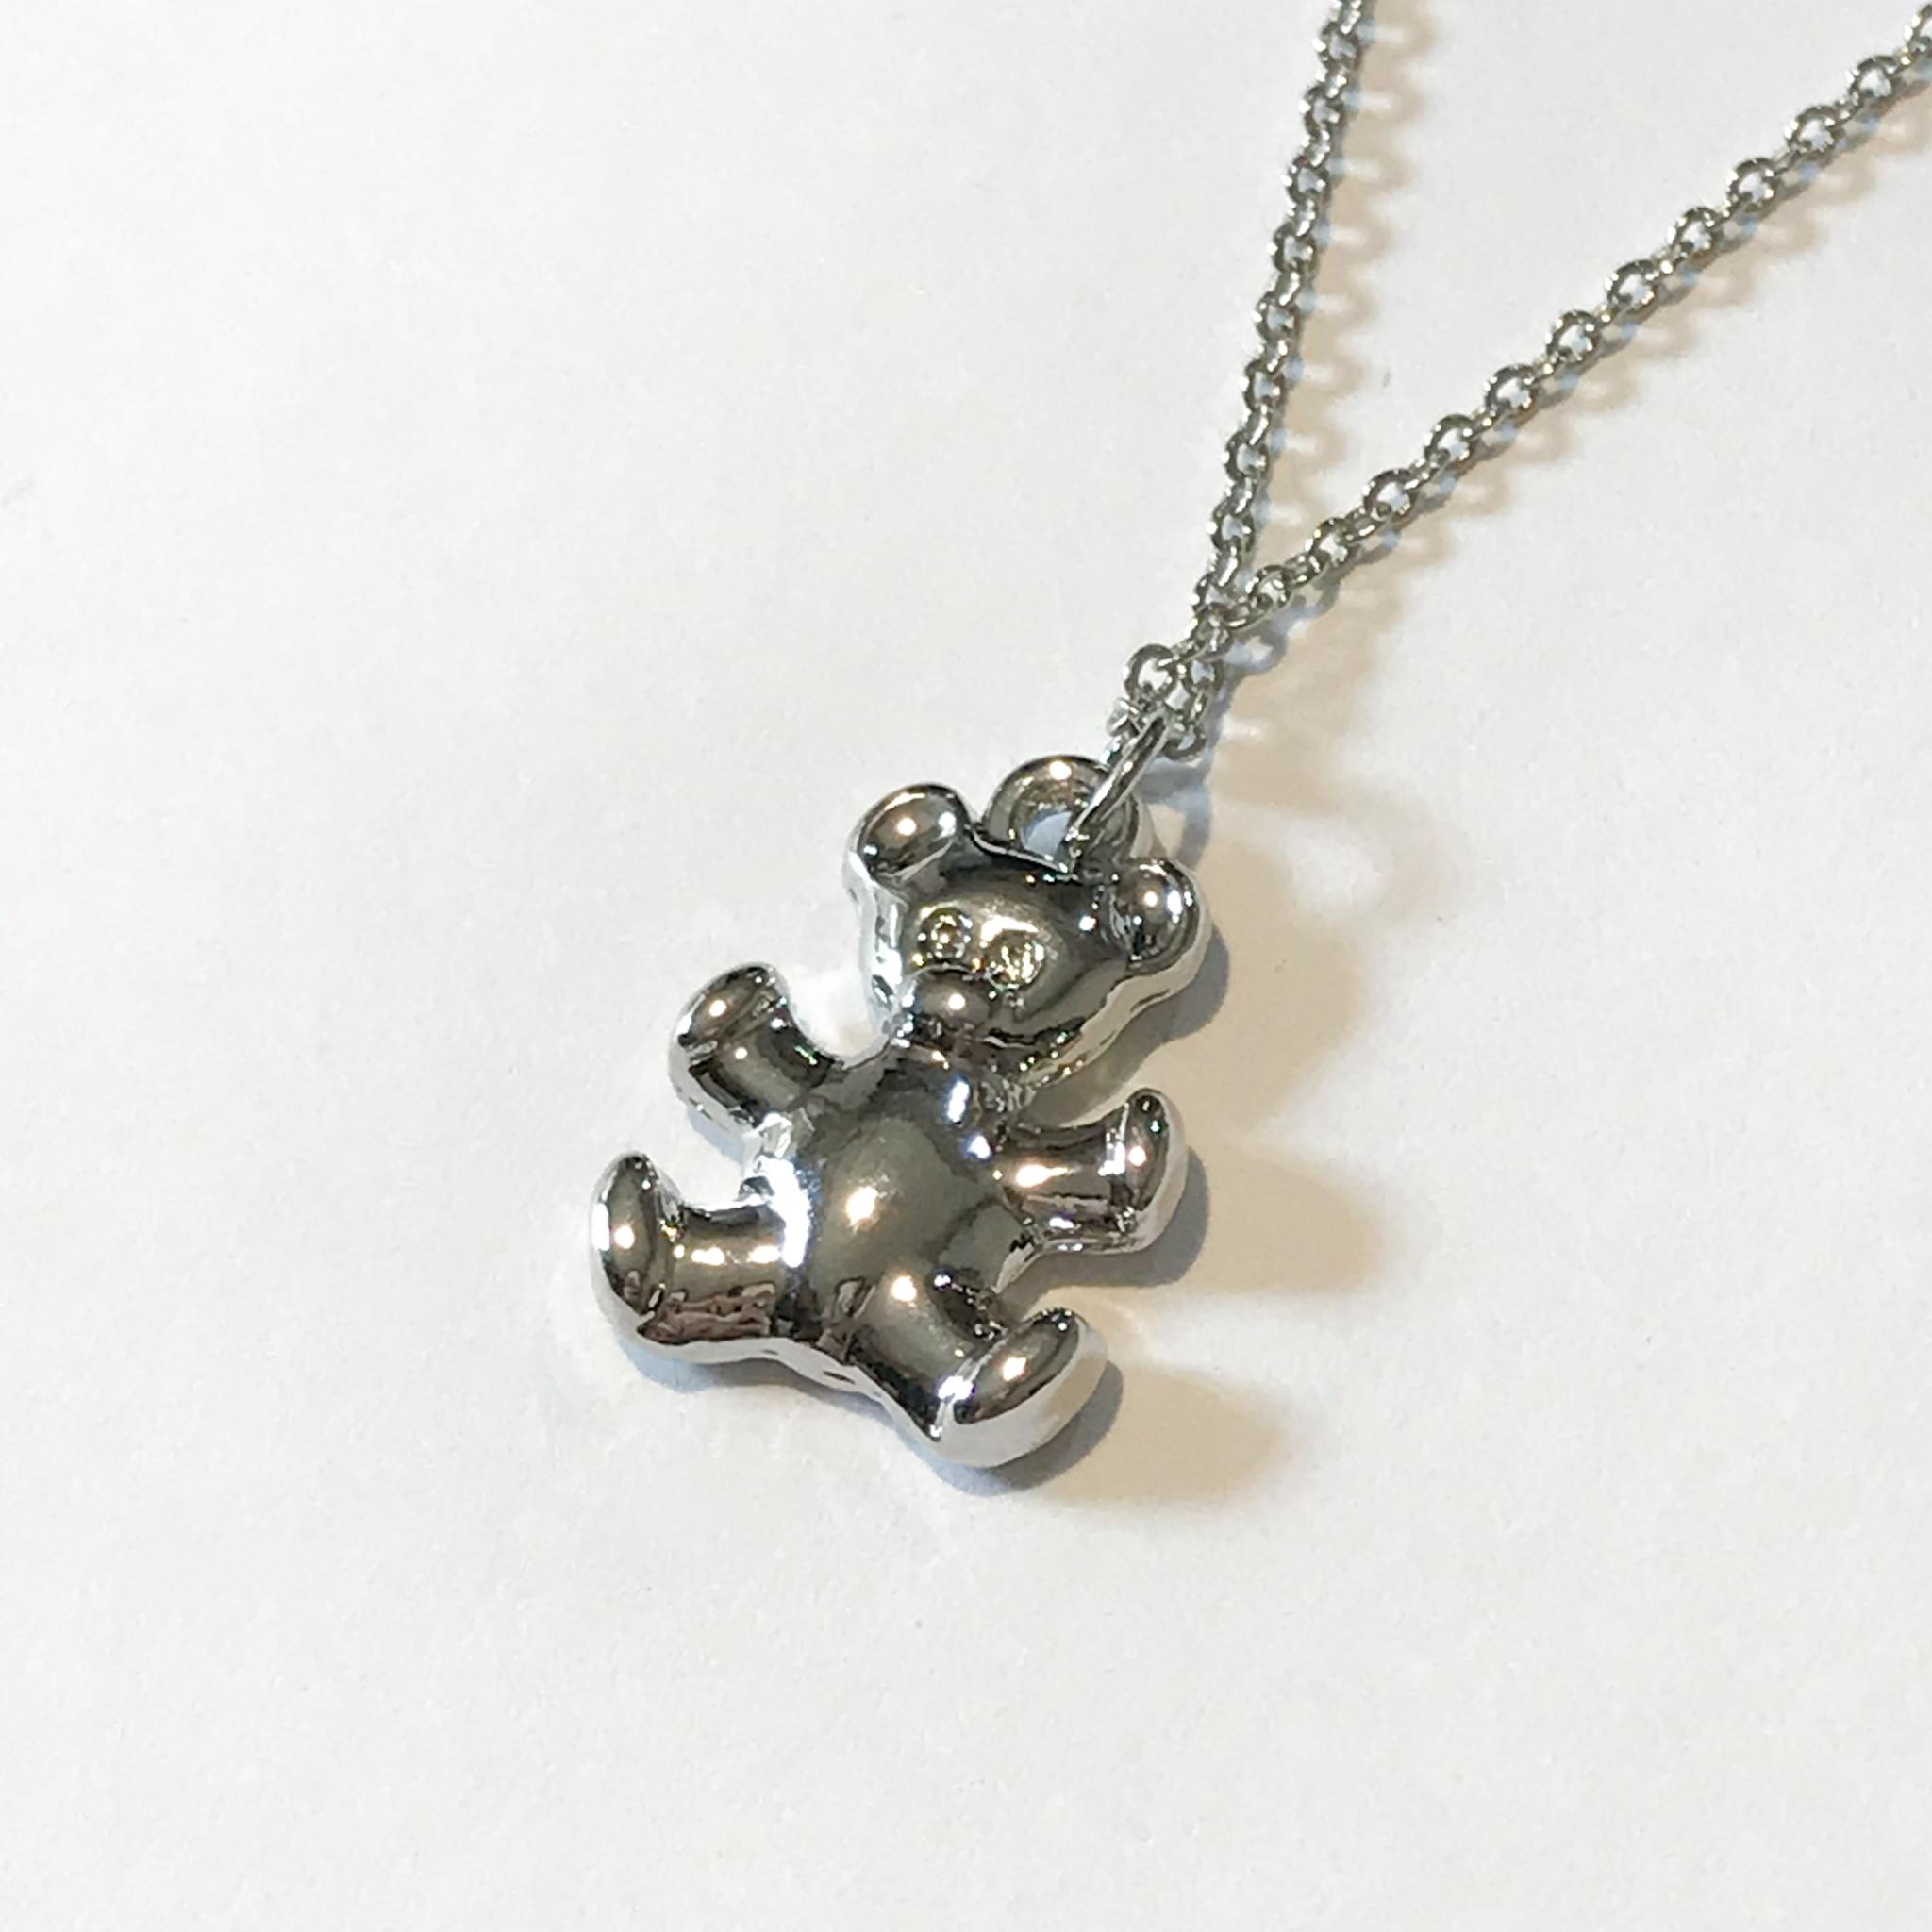 DAYNYC bear necklace